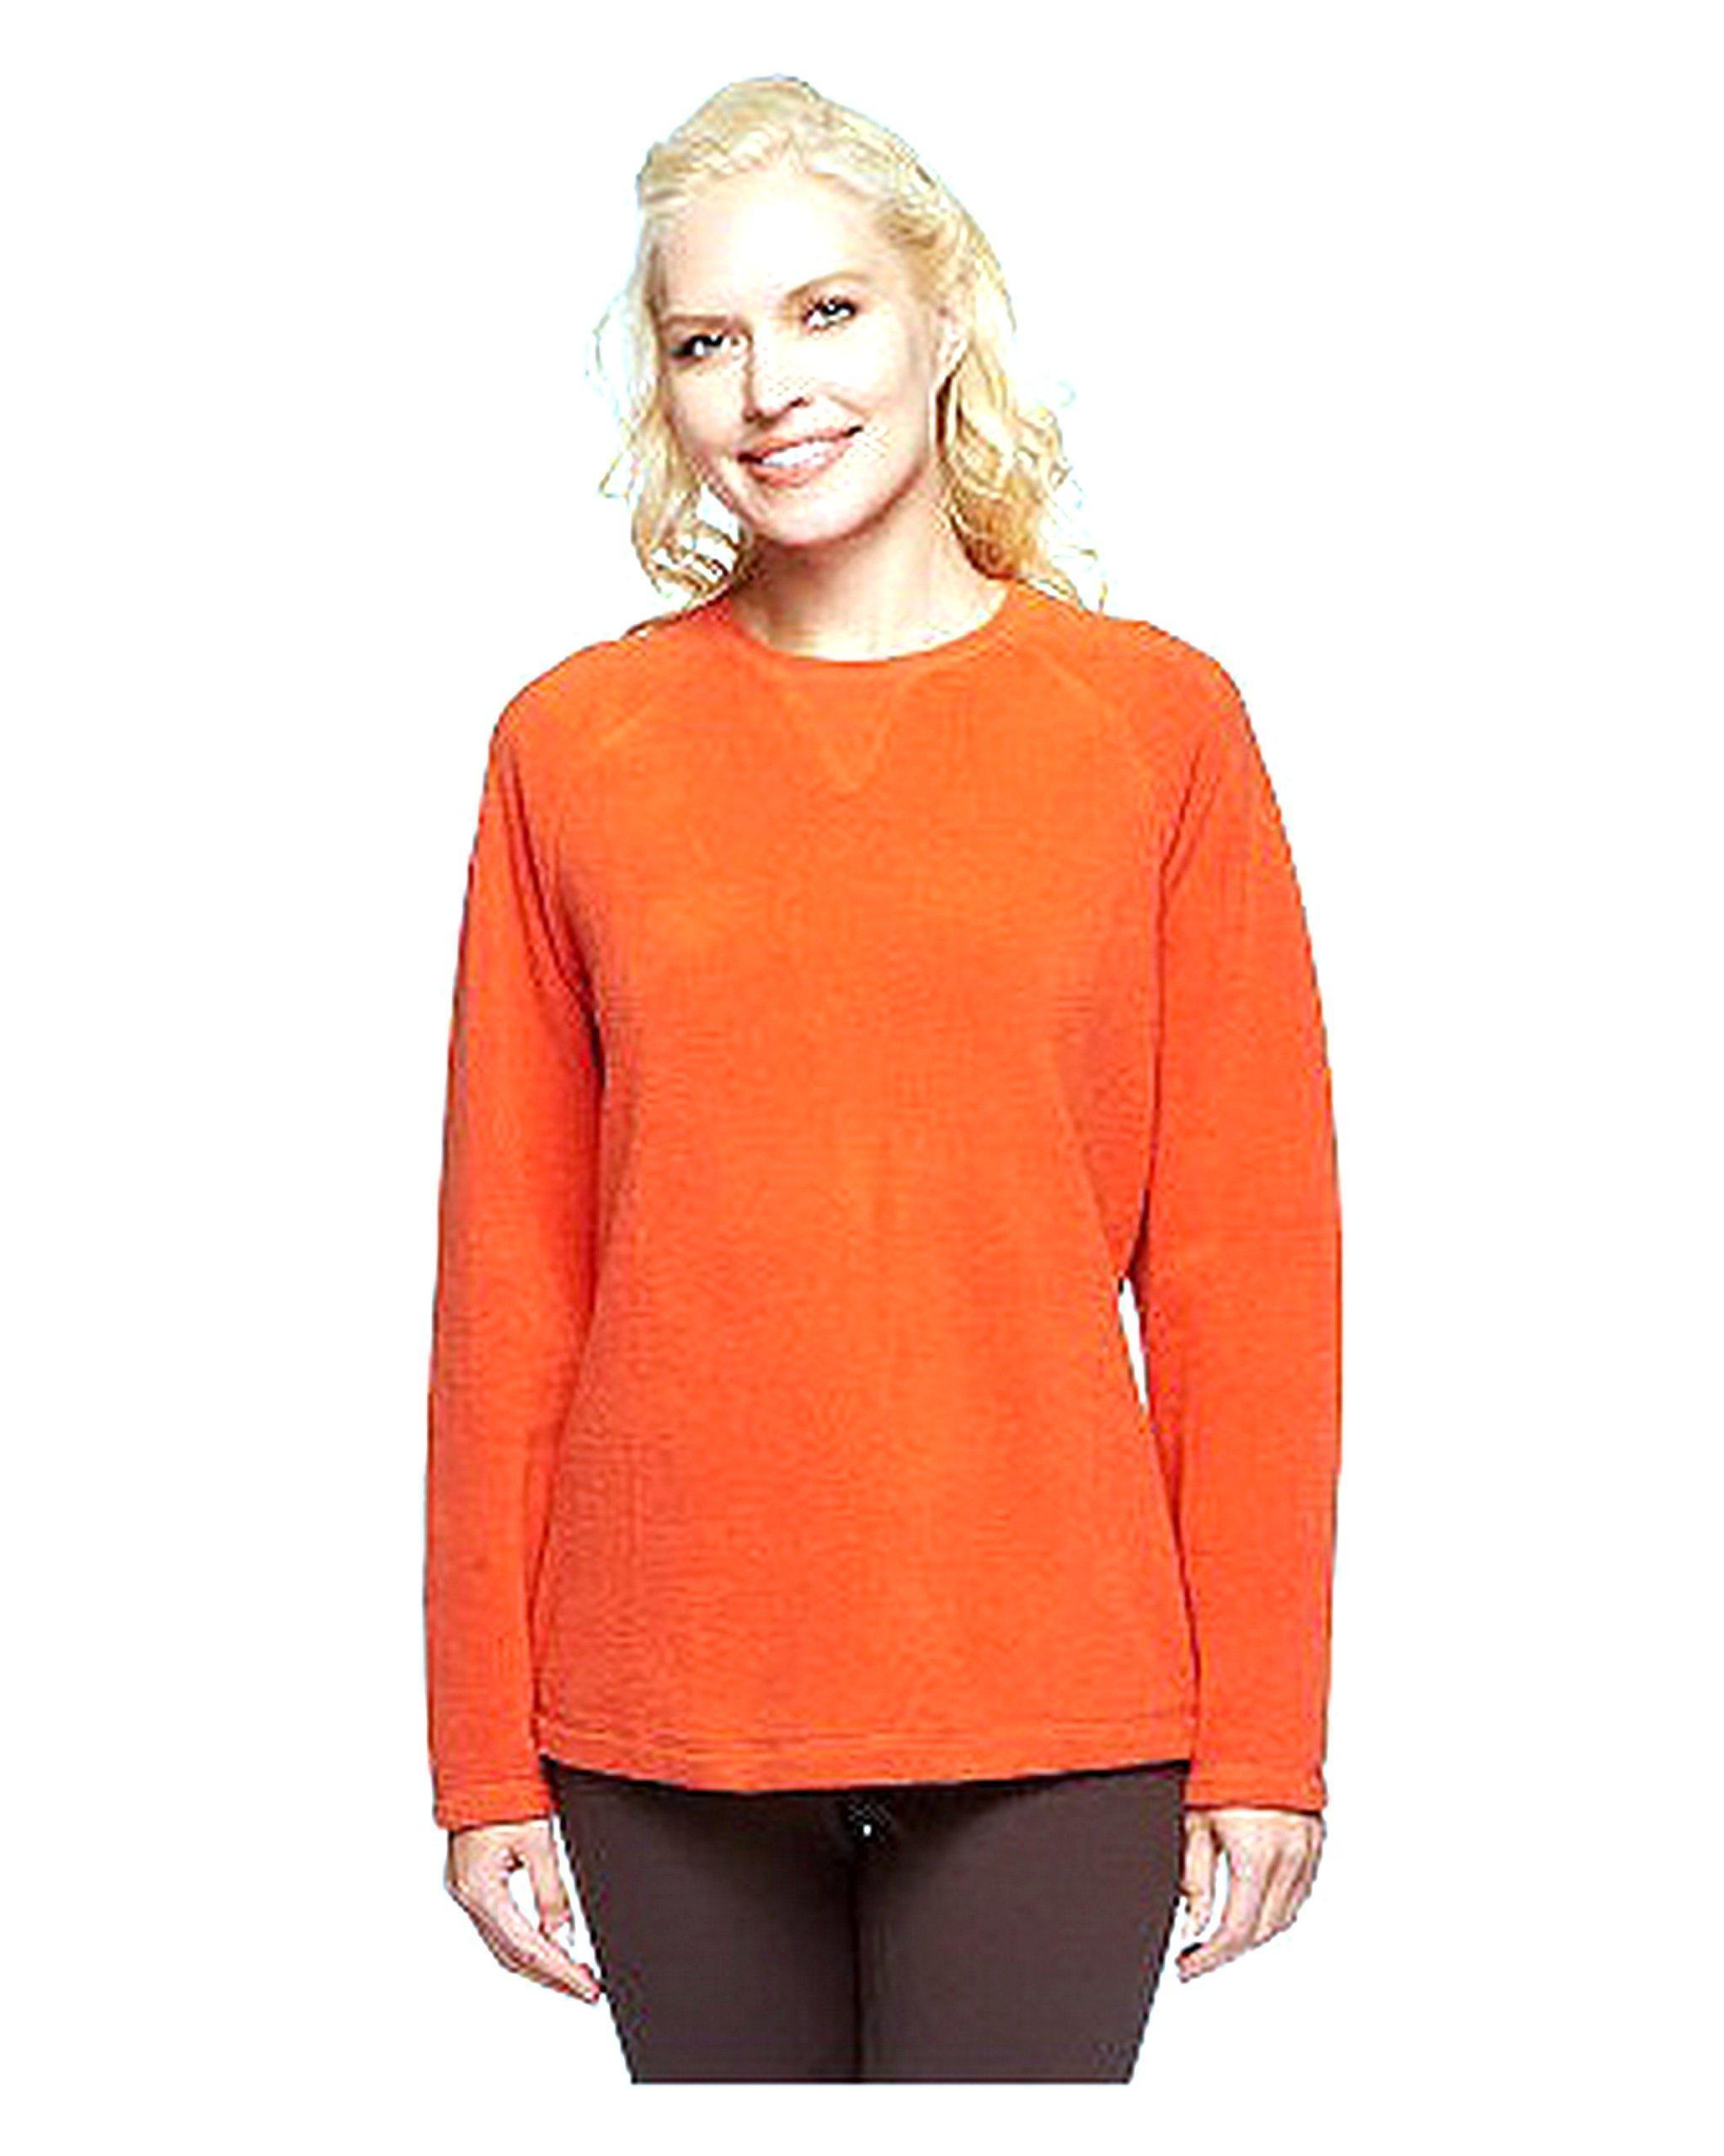 DENIM & CO. Womens Baby Sherpa Crew Neck Sweatshirt Multi 240505RM (1X, Spice Orange)